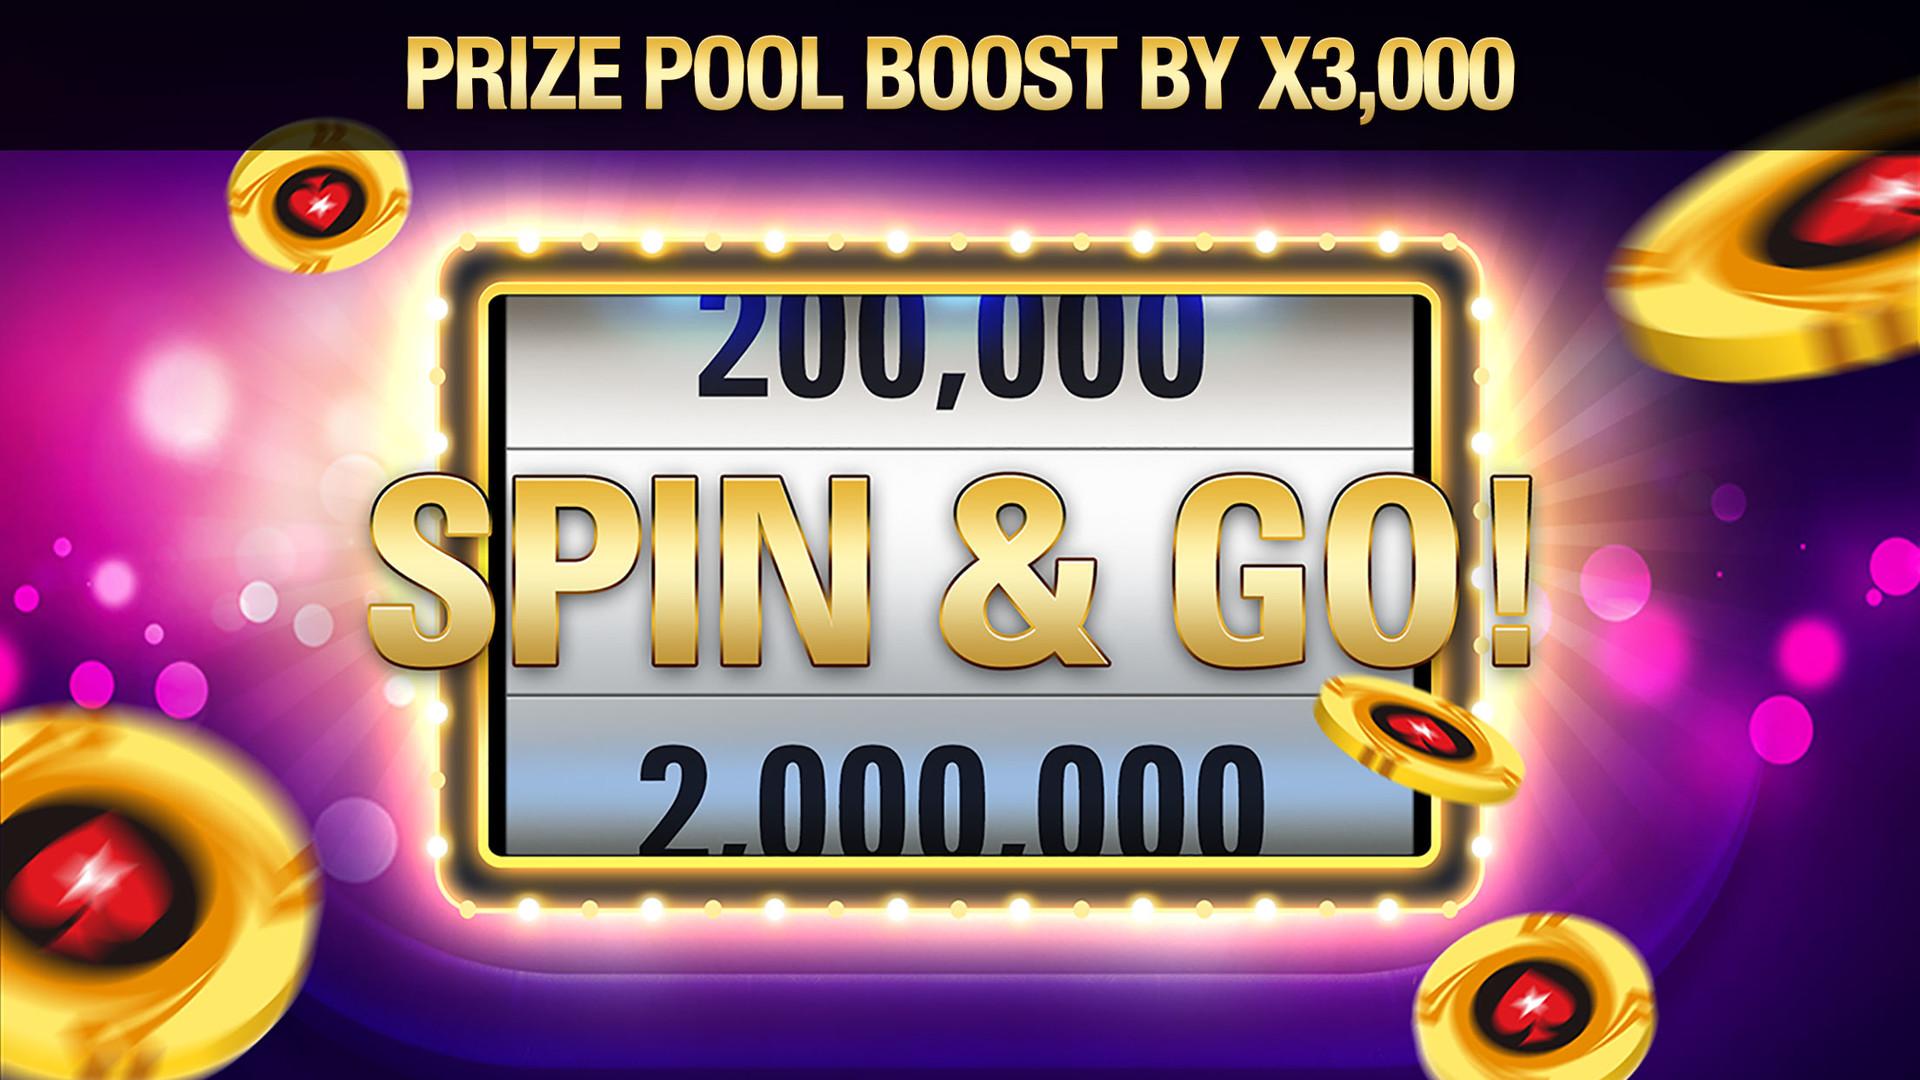 Pokerstars poker casino carps sa rand online casinos